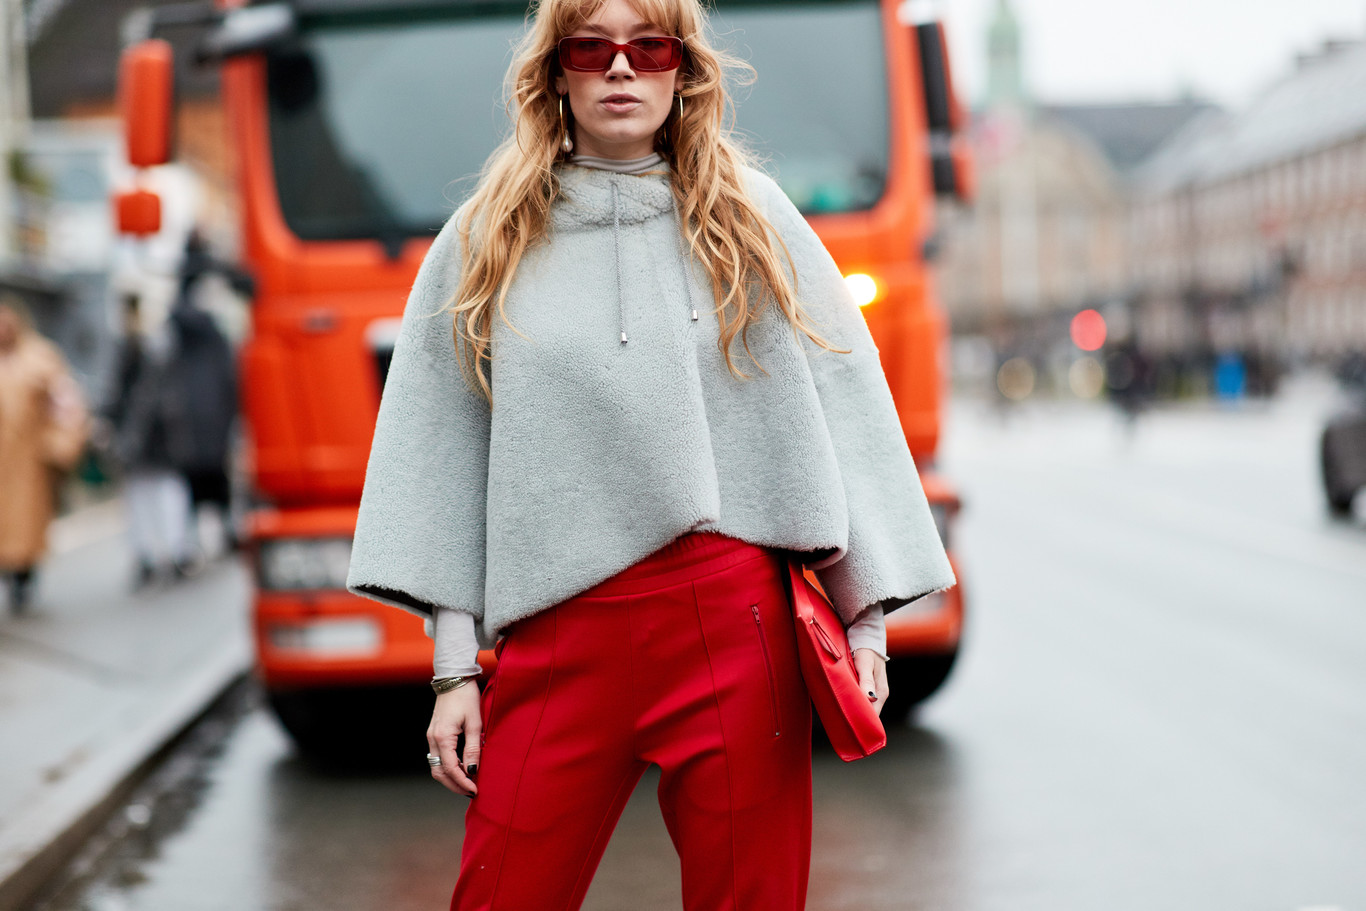 59e29914ce Cómo combinar un pantalón rojo para triunfar con tu look